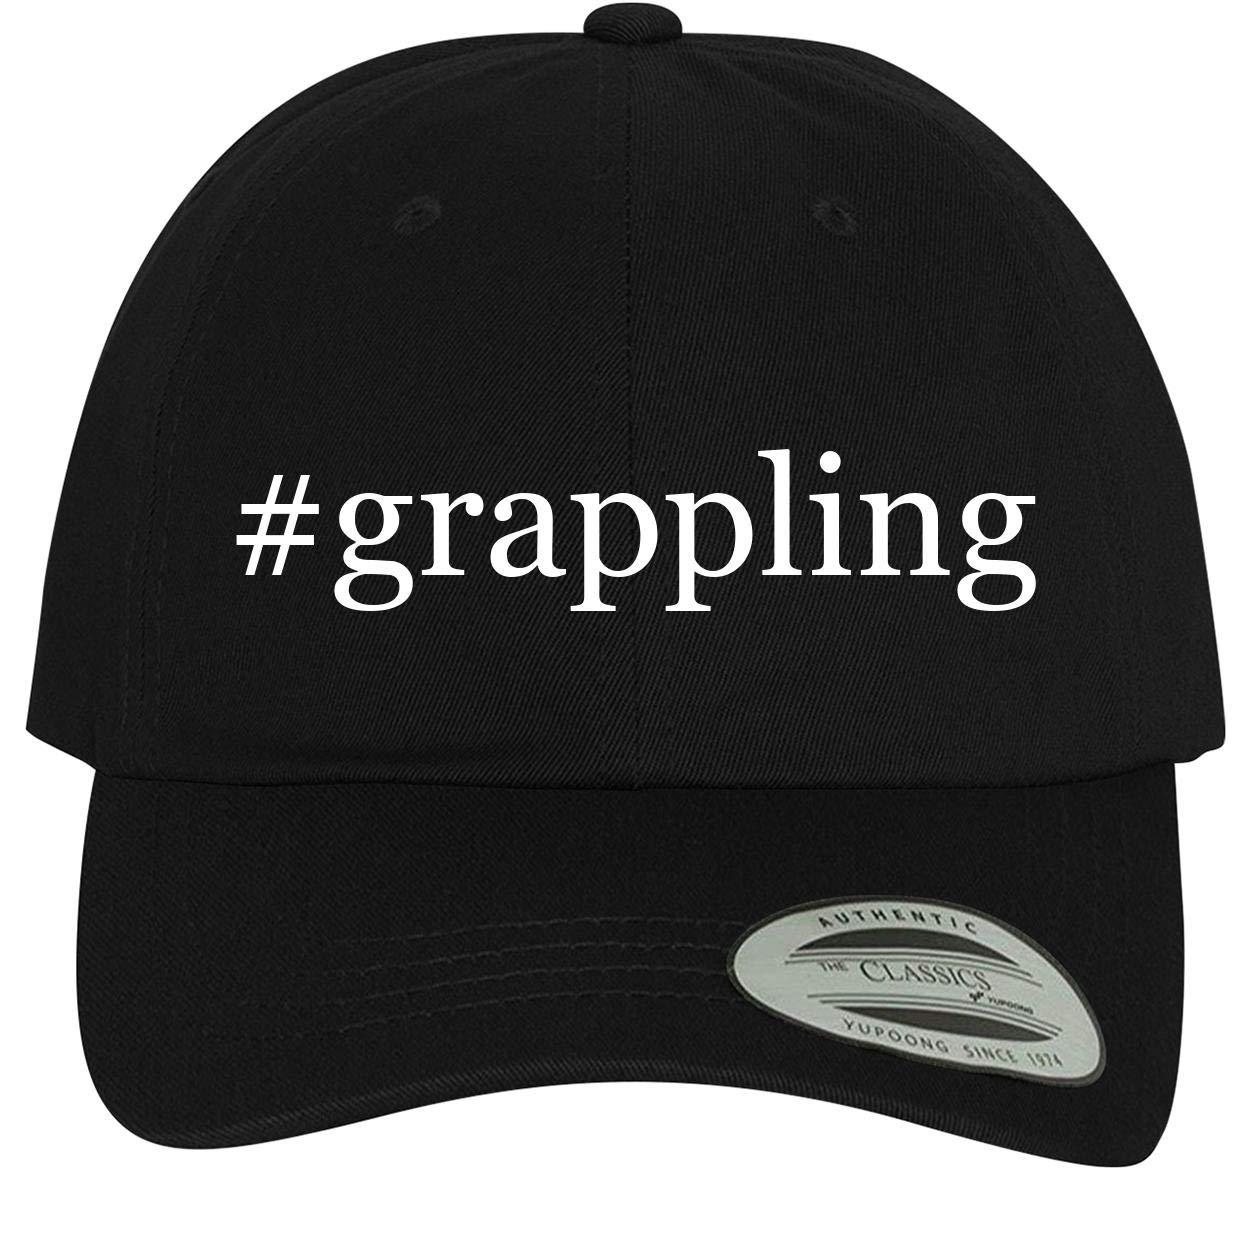 Comfortable Dad Hat Baseball Cap BH Cool Designs #Grappling